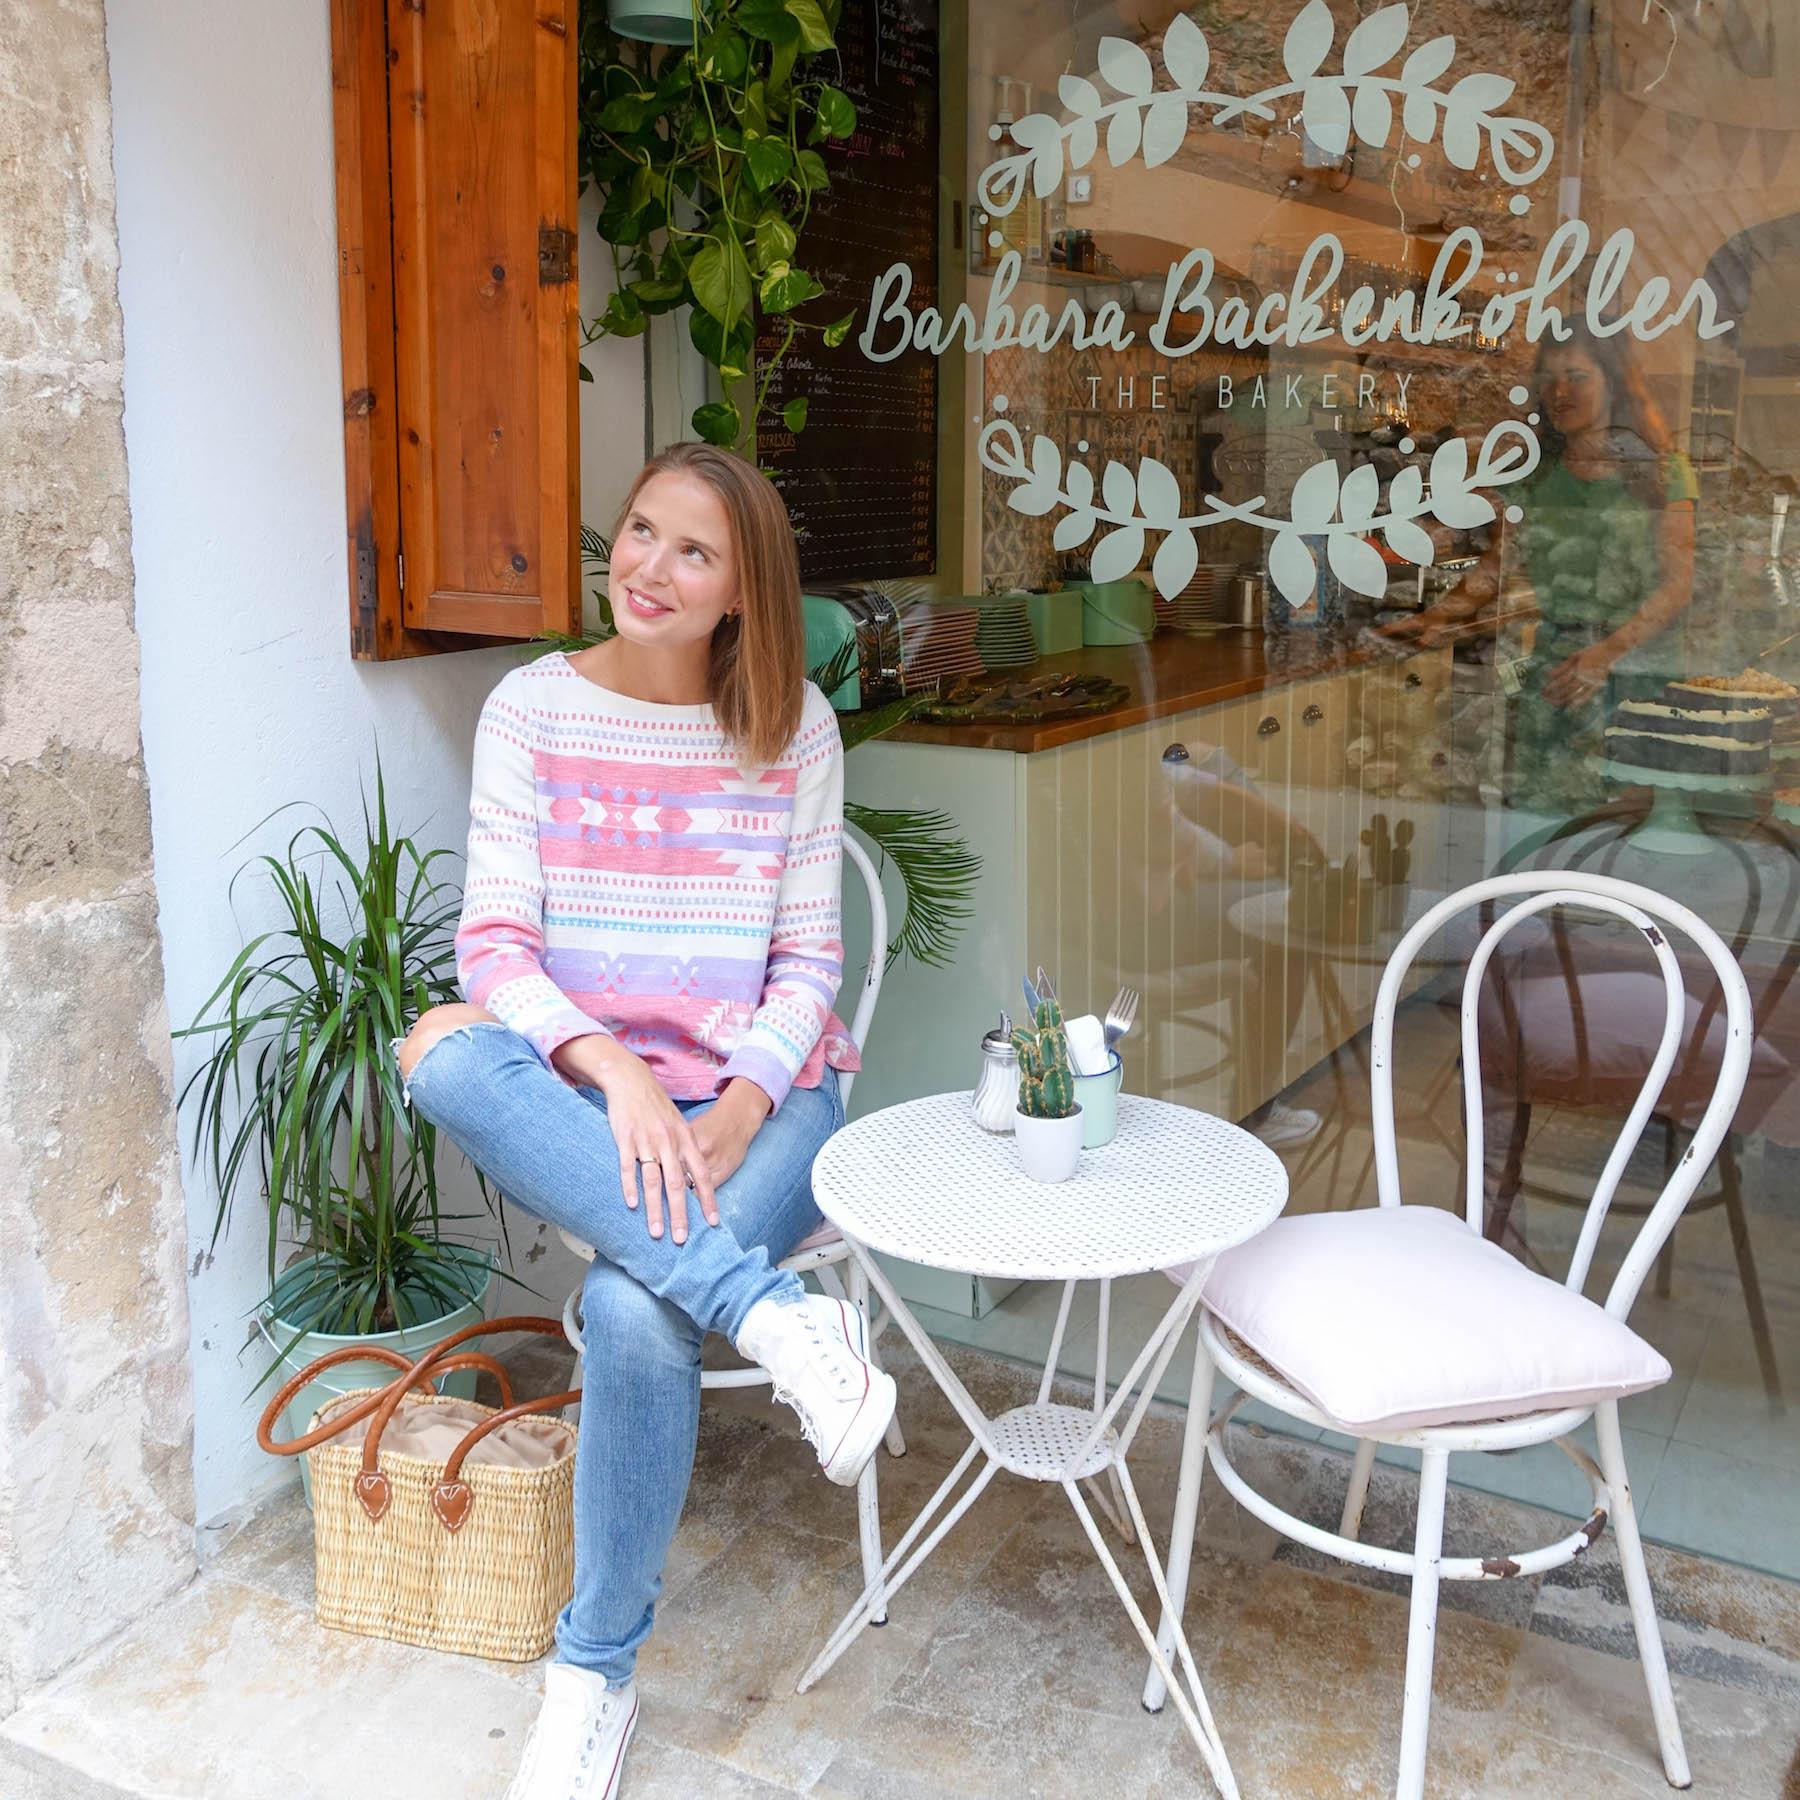 restaurant in Pollença suelovesnyc_susan_fengler_travel_blog_reiseblog_mallorca_pollenca_pollensa_barbara_baeckerkoehler_the_bakery